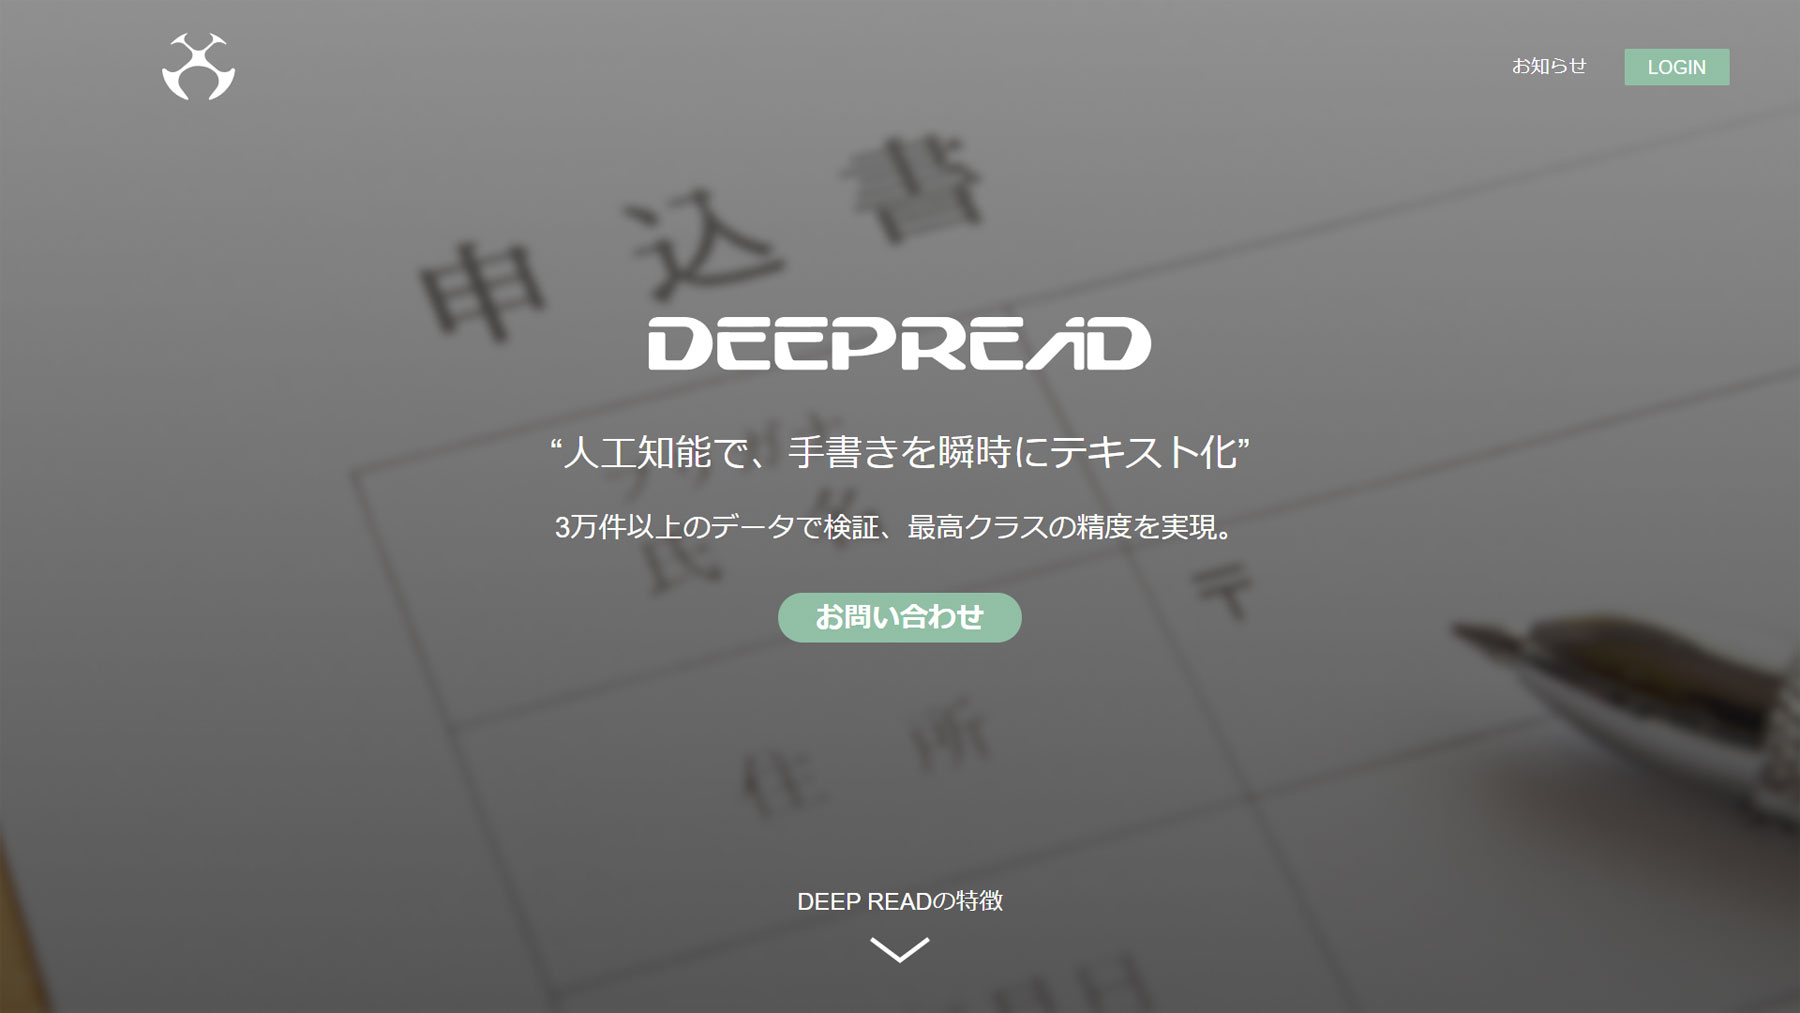 DEEP READ